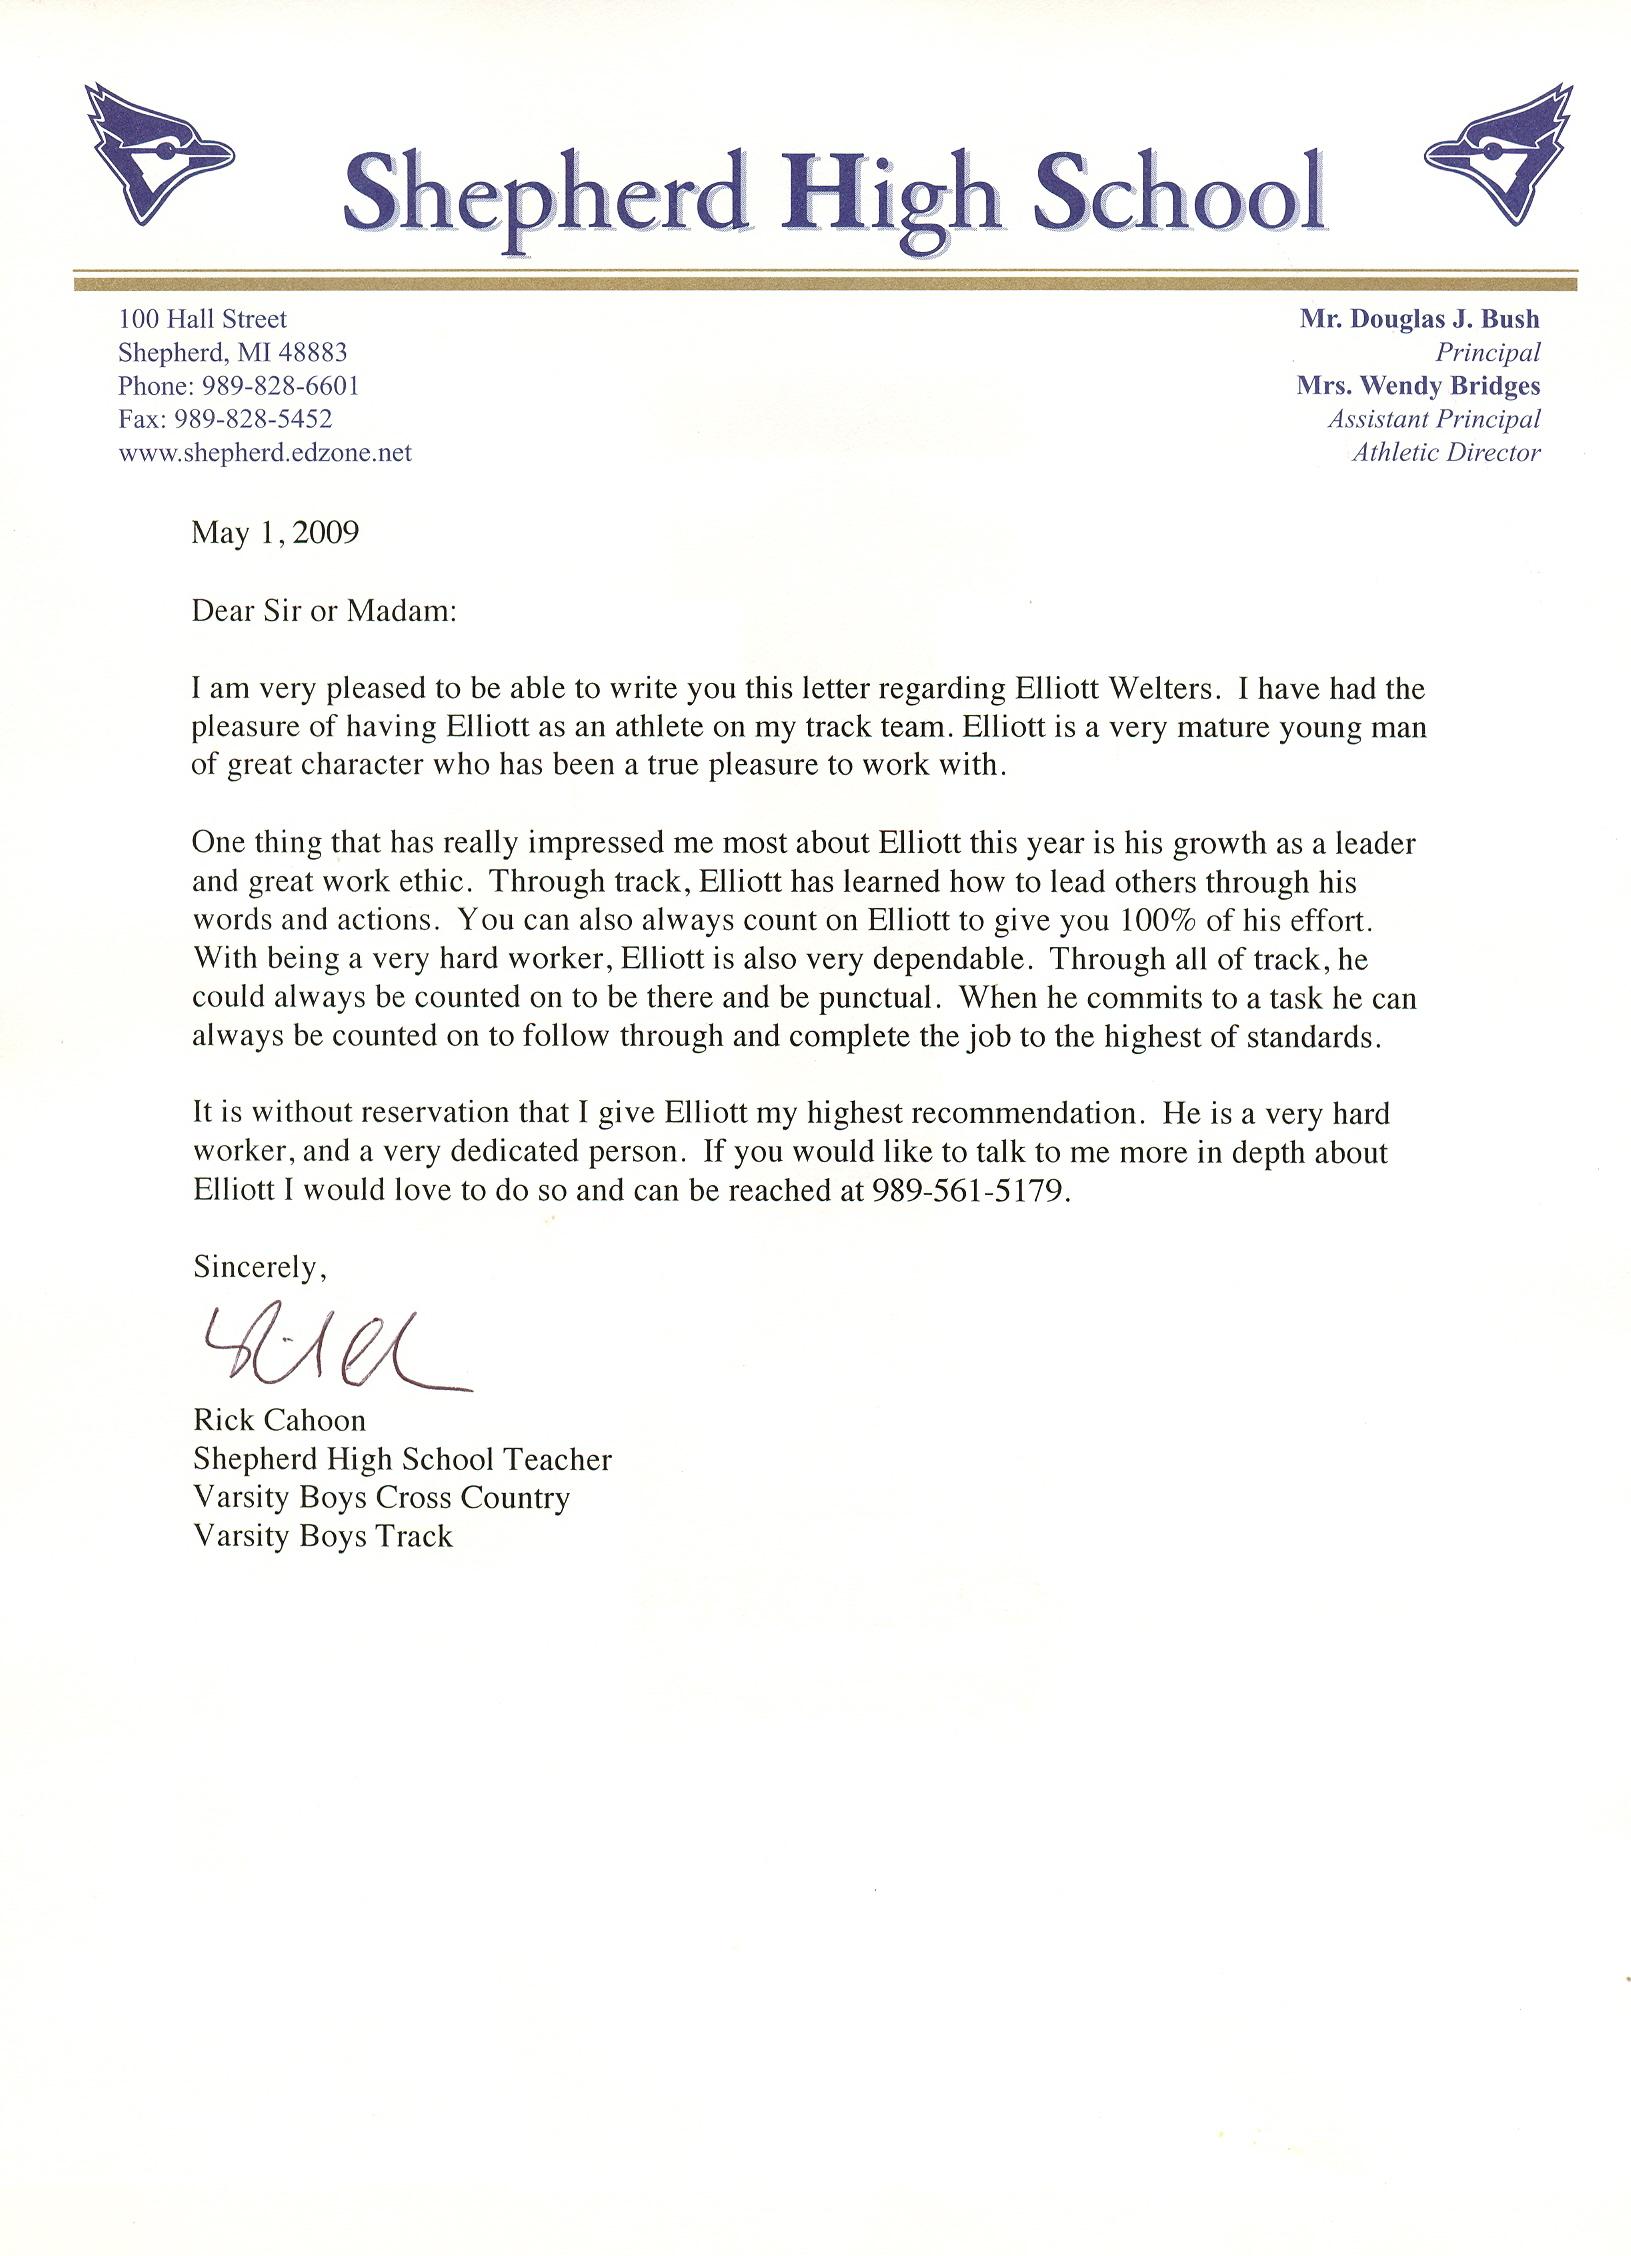 Letter Of Recommendation For Scholarship Tips Samples Personal Testimony Elliott Welters Portfolio